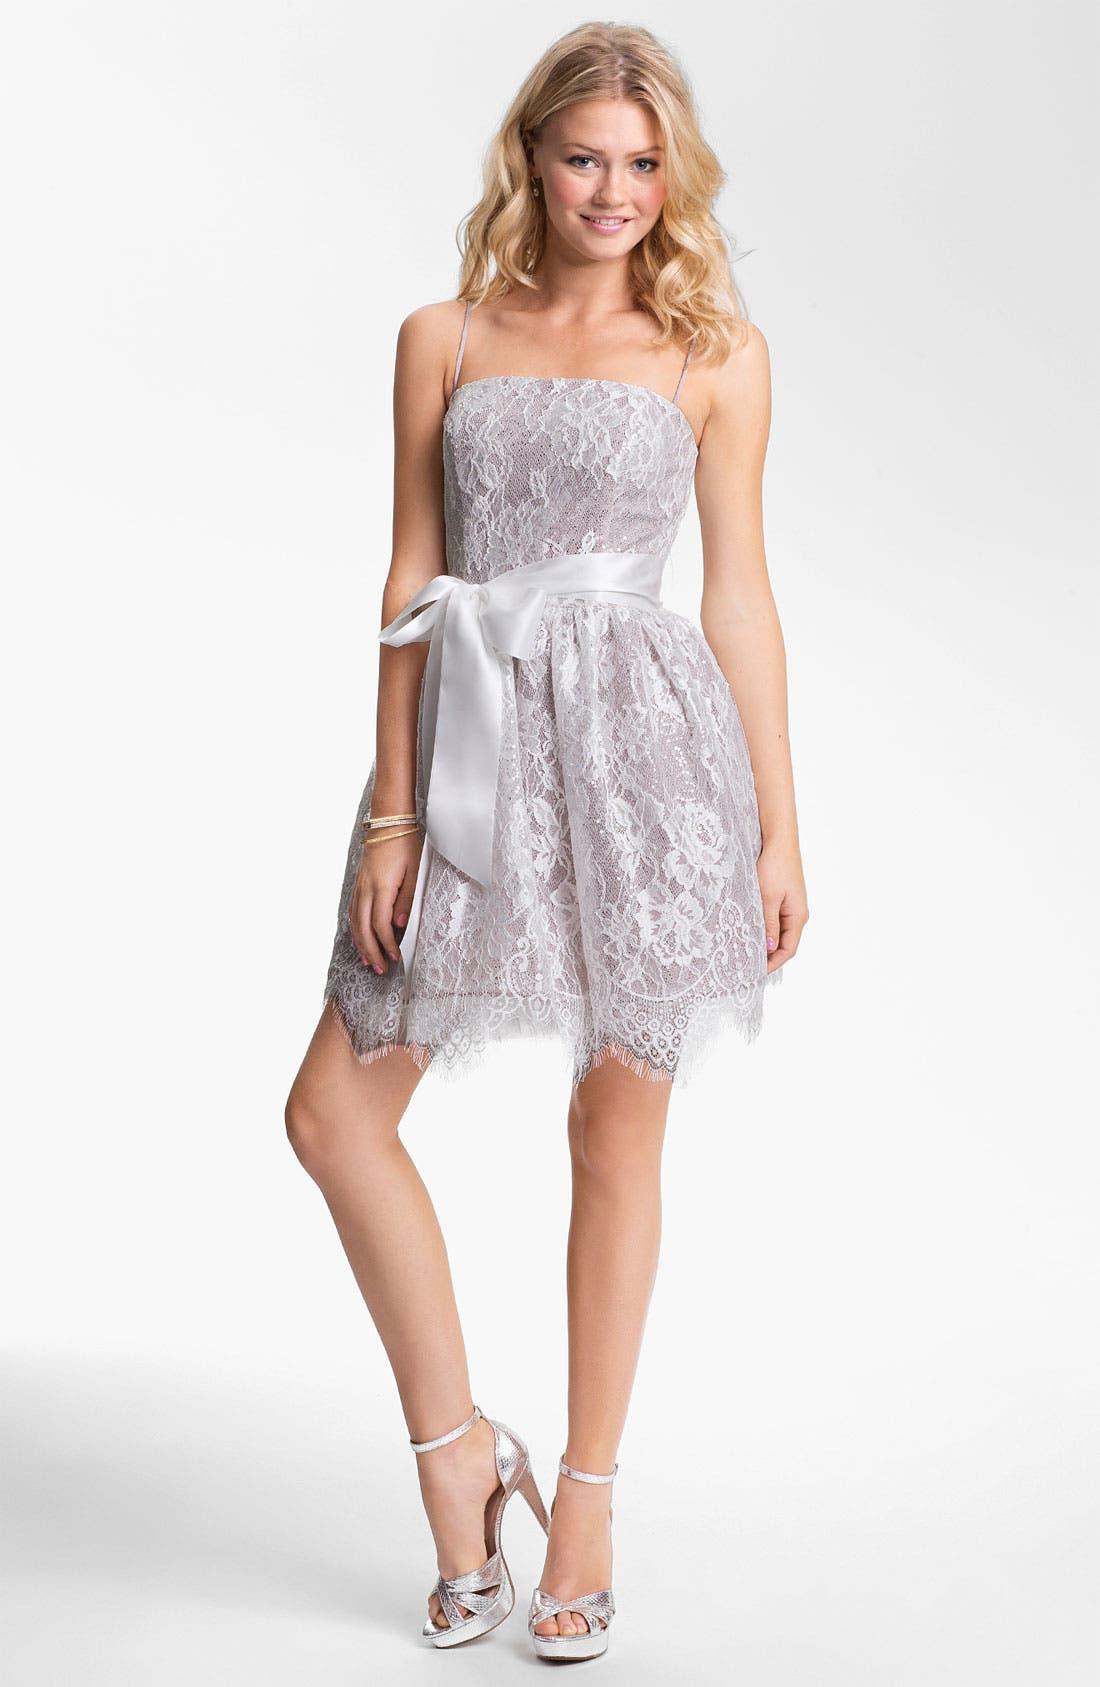 Main Image - Jessica McClintock Sequin Lace Fit & Flare Dress